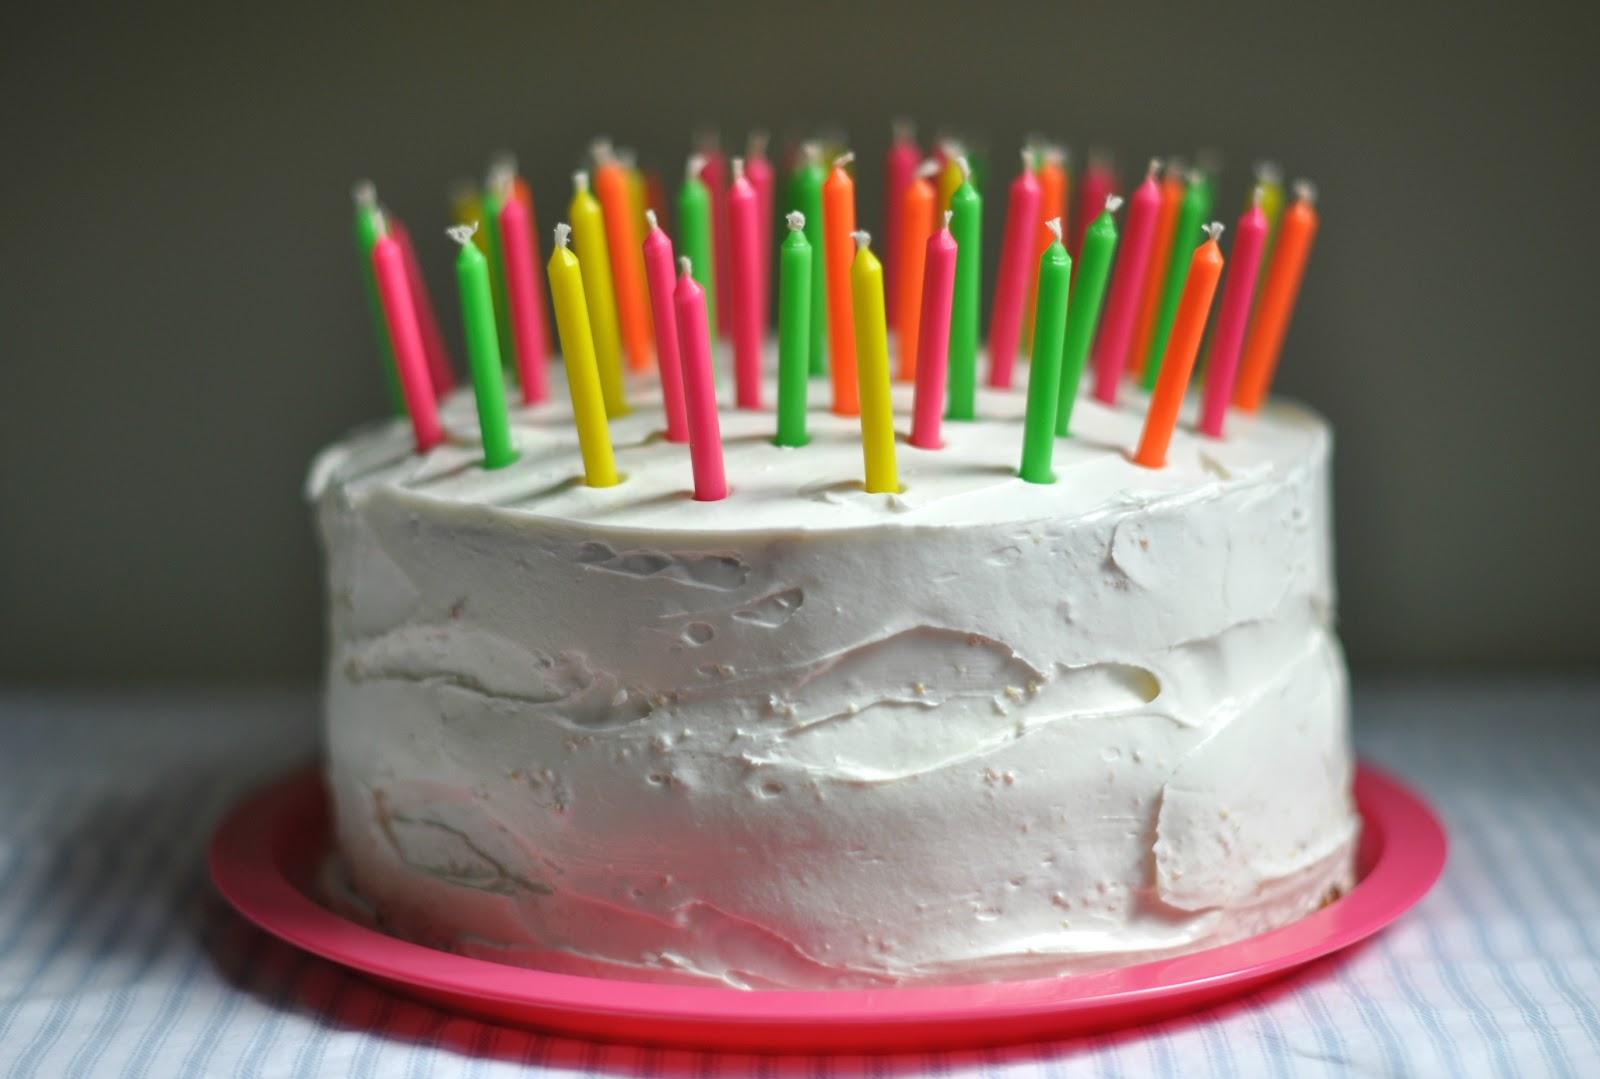 Image Colorful Birthday Cakeg Creepypasta Wiki Fandom